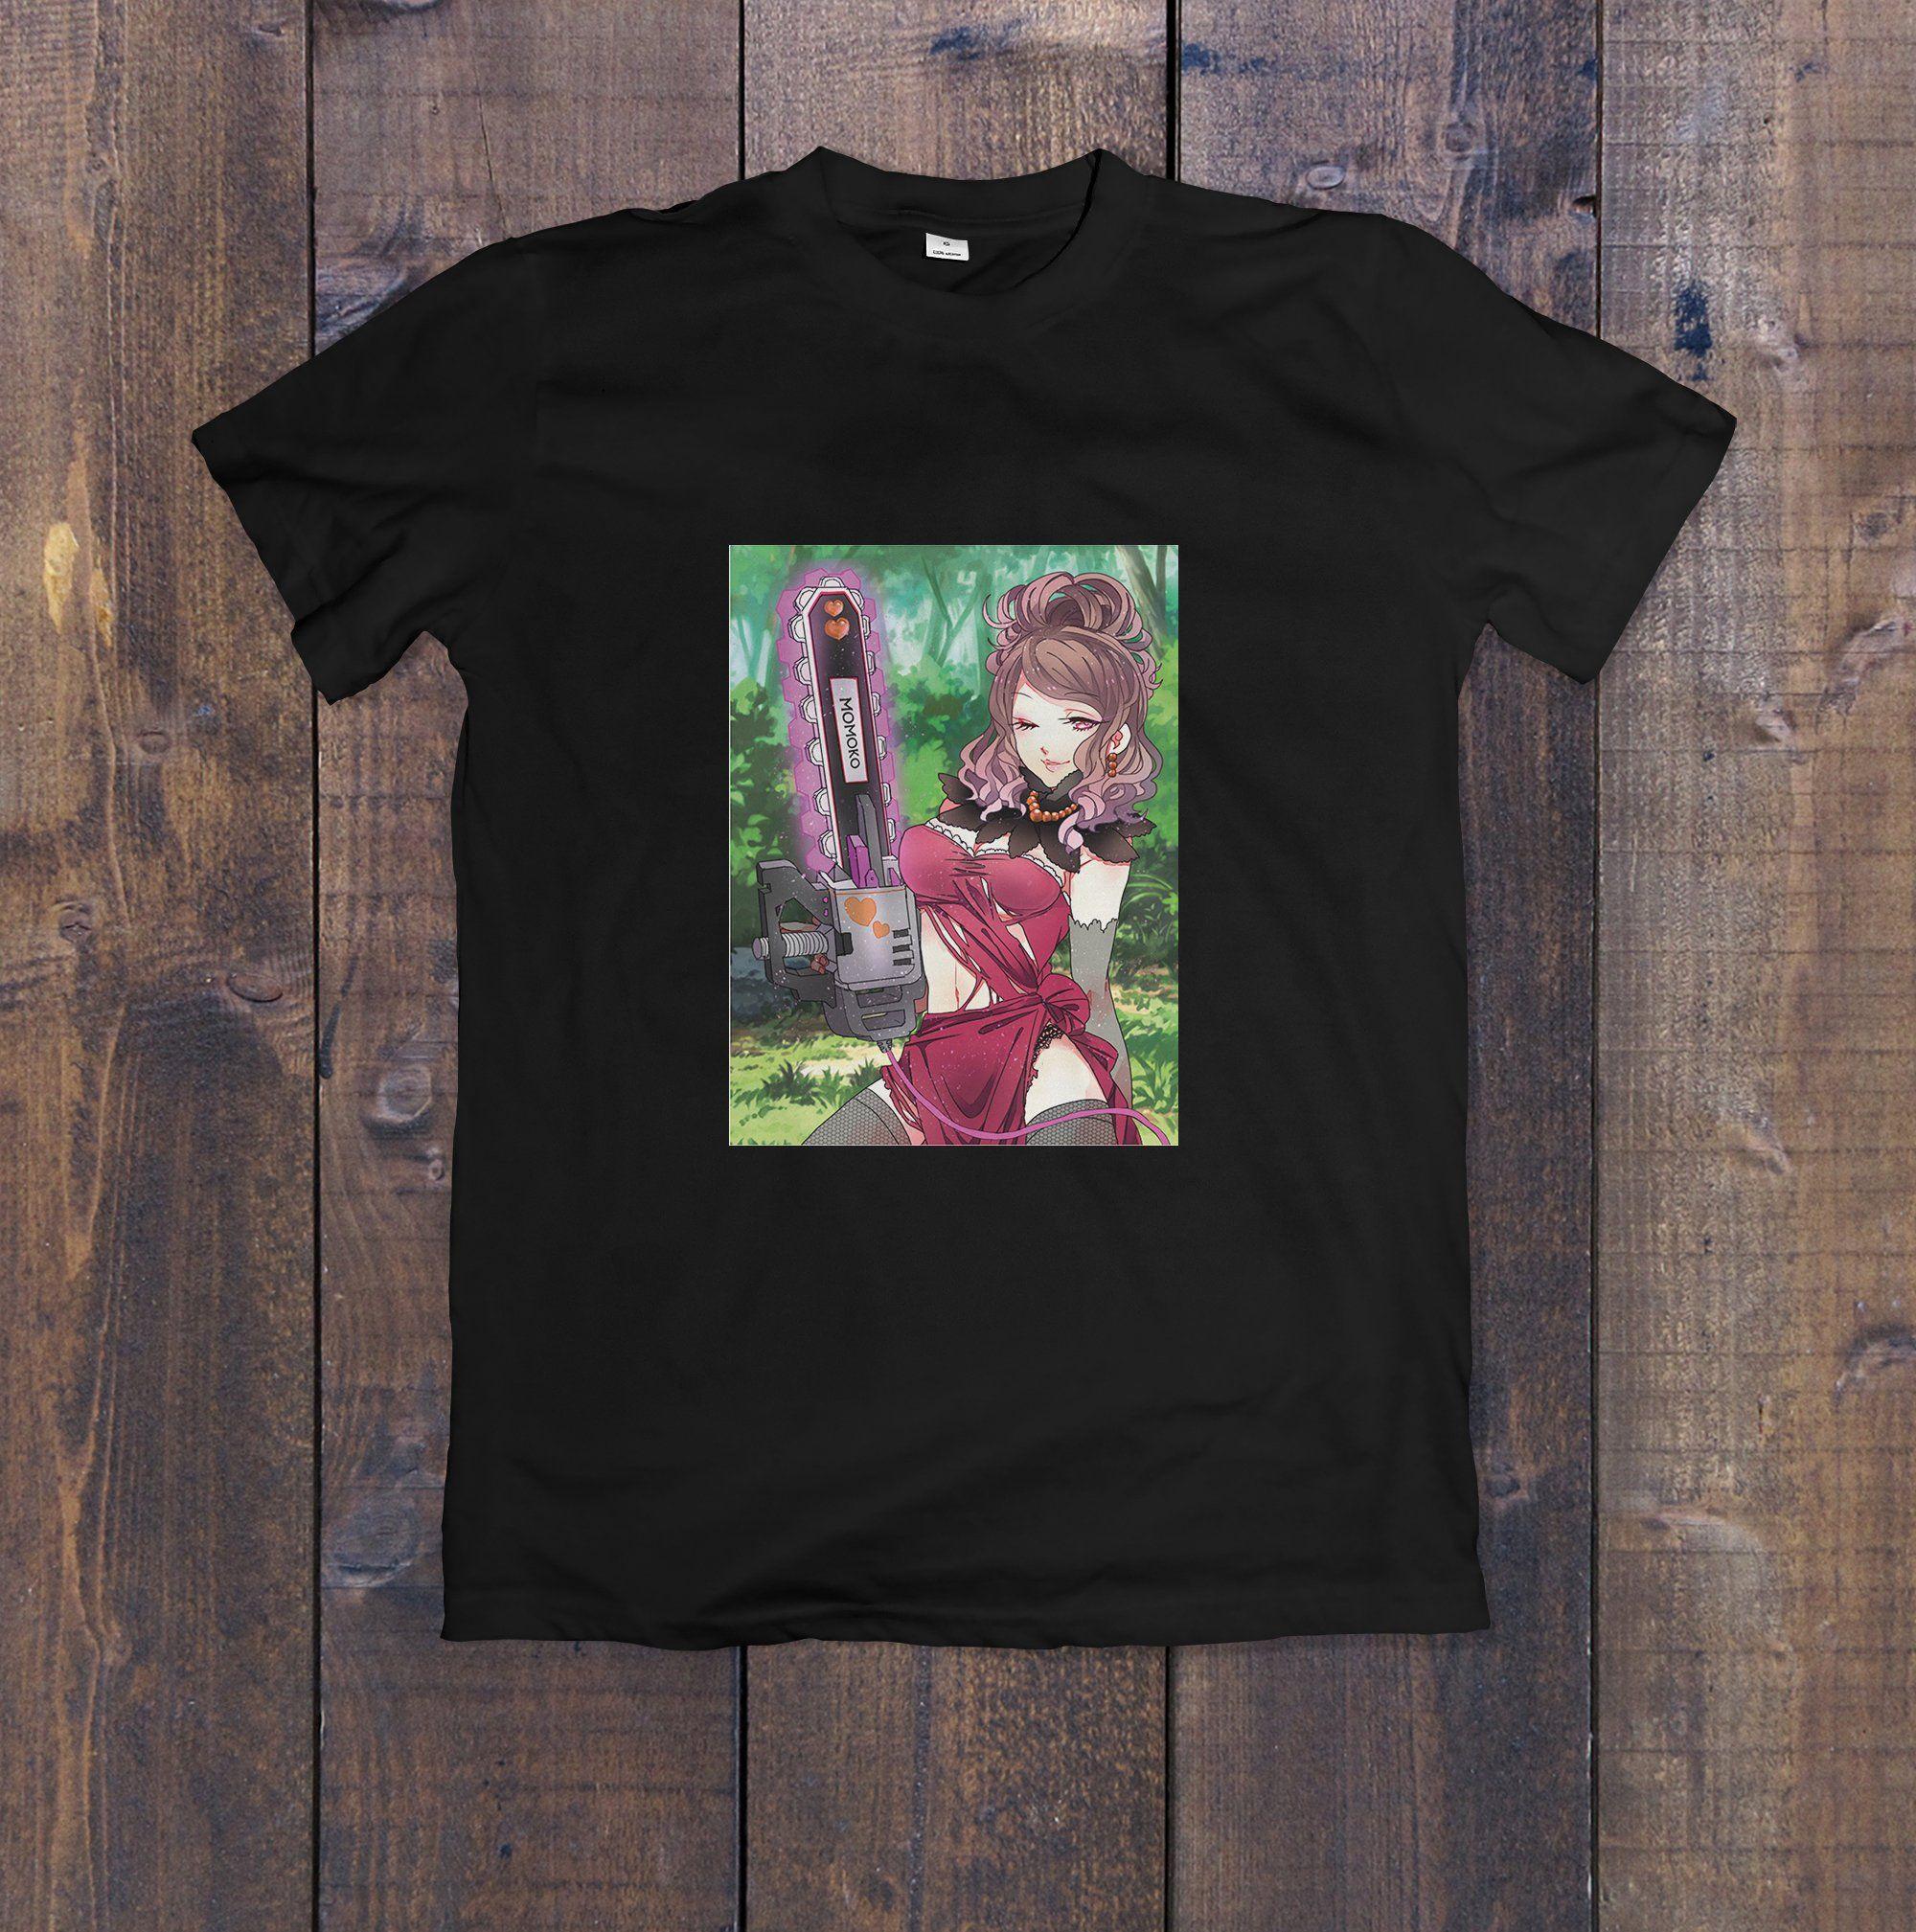 Kawaii Japanese Anime T Shirt Manga Free Shipping Gift For